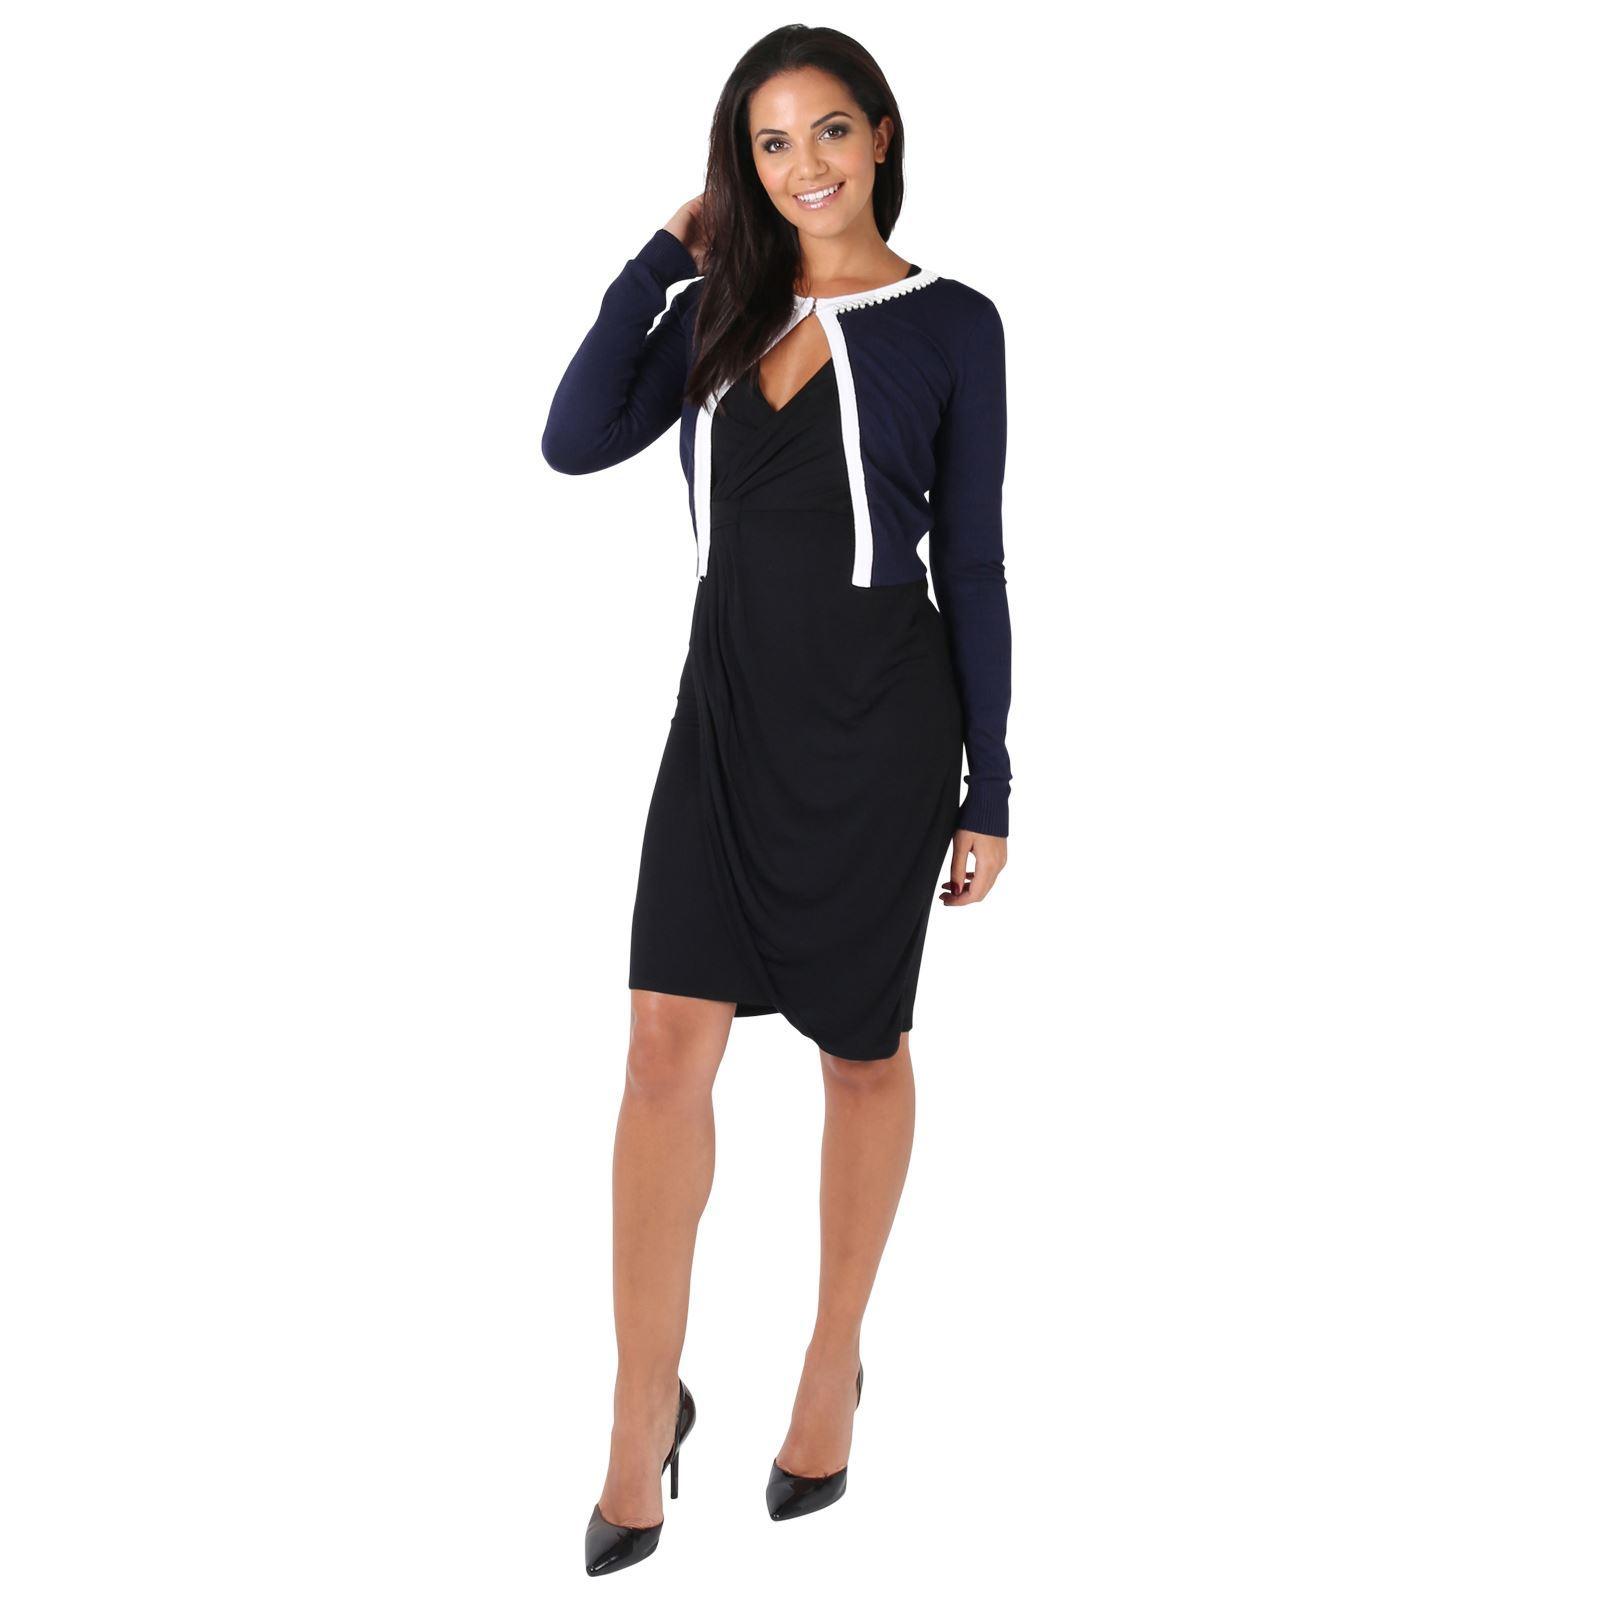 Womens-Ladies-Bolero-Shrug-Silky-Soft-Cardigan-Long-Sleeve-Knit-Short-Top-Work thumbnail 19